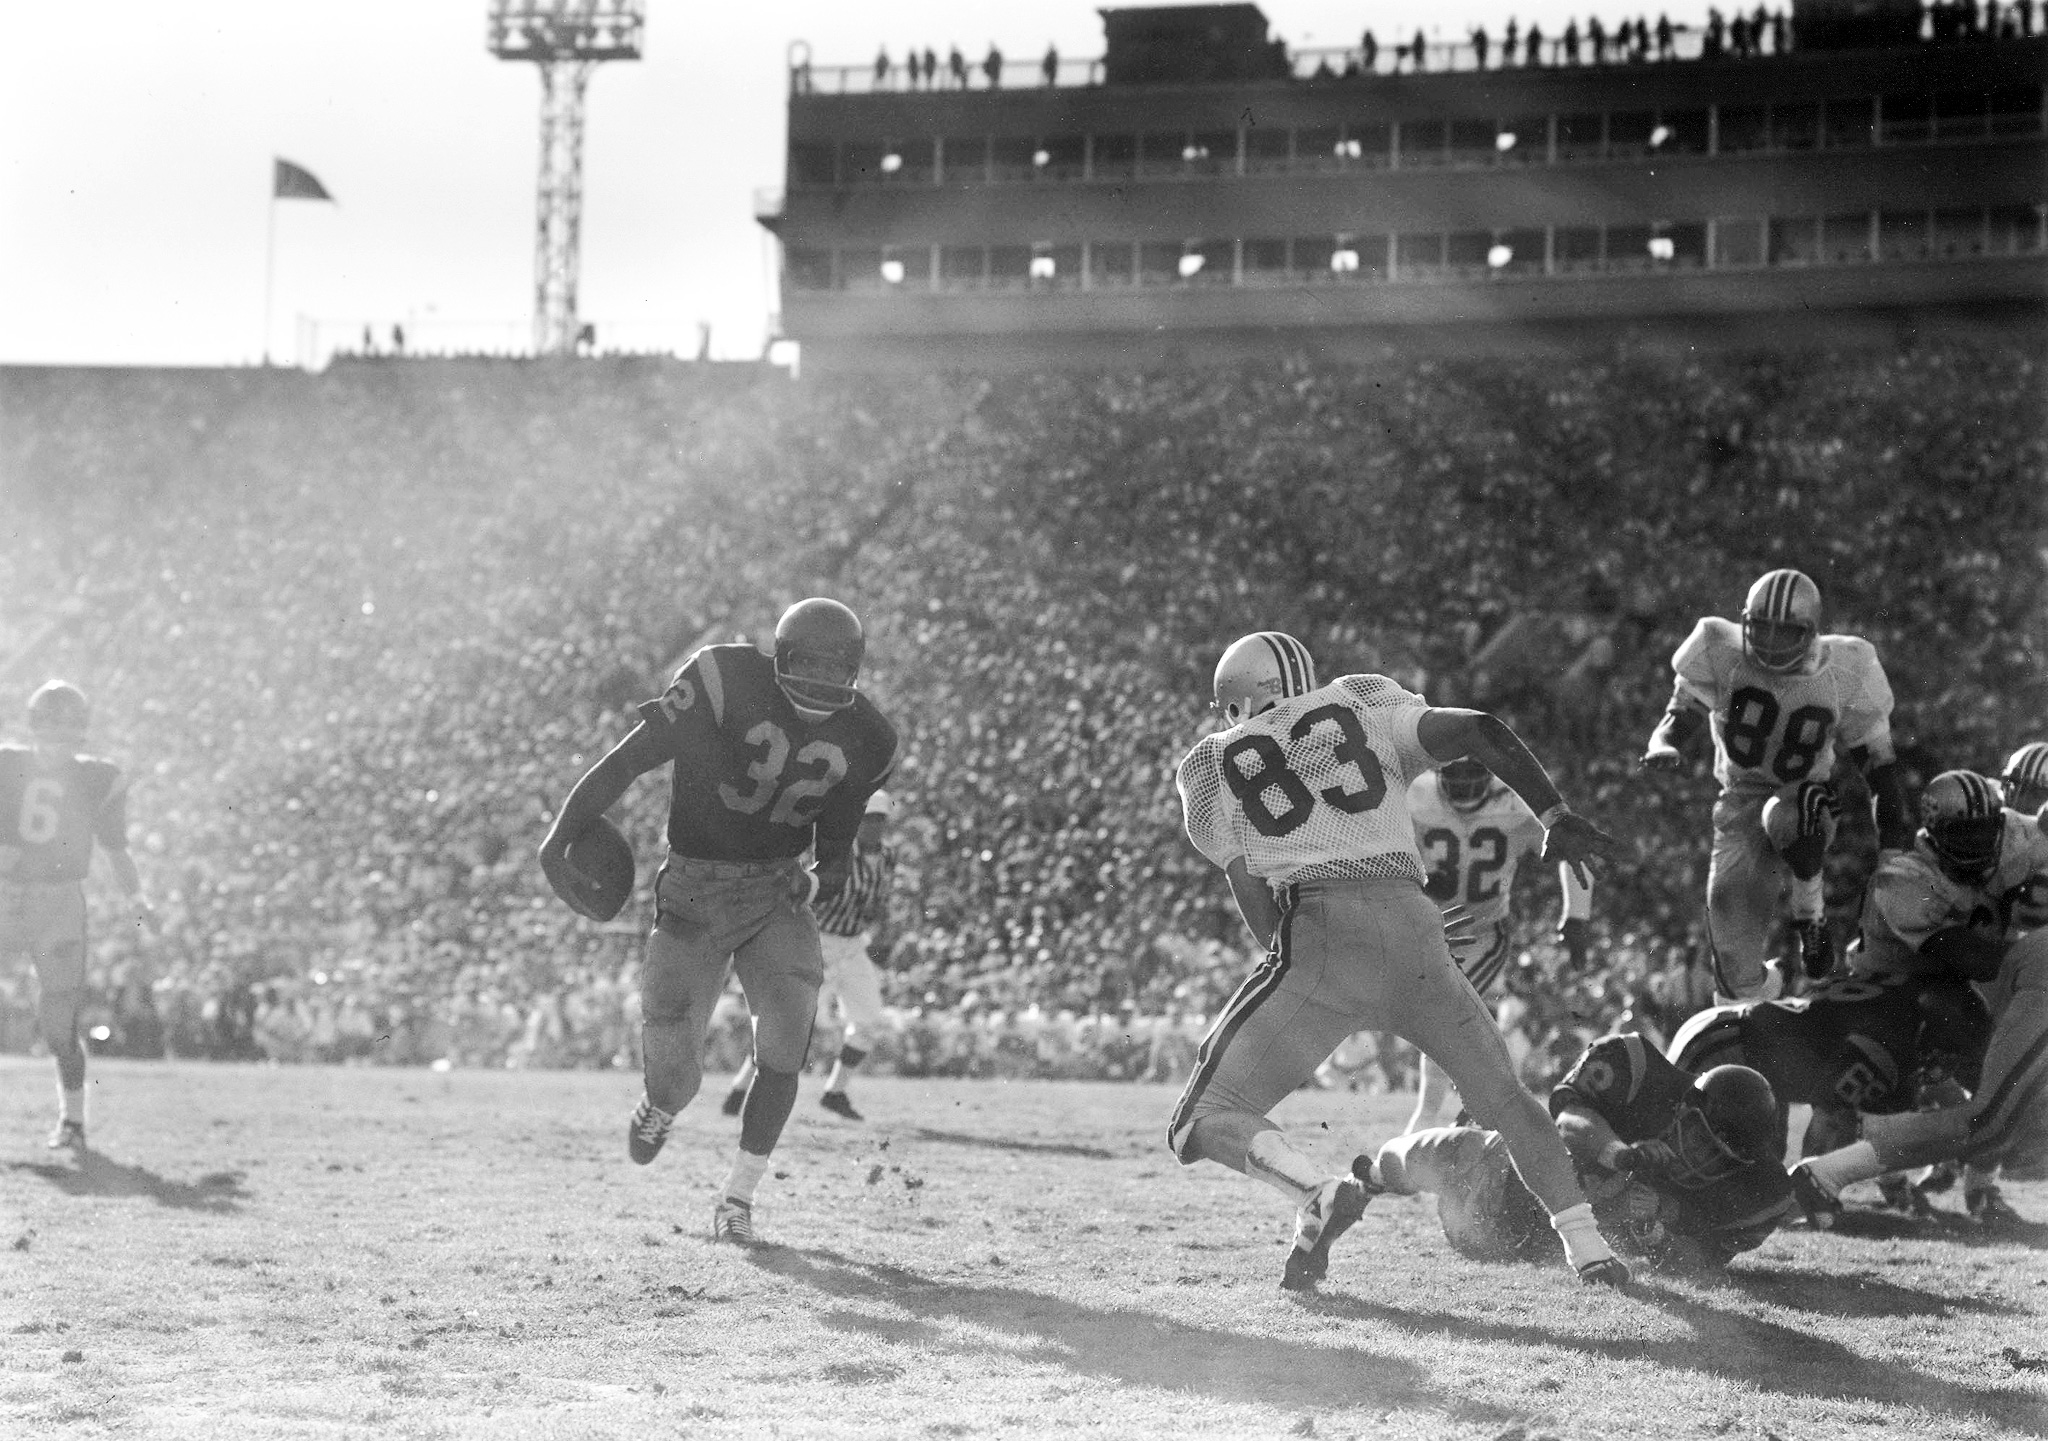 1969 Rose Bowl